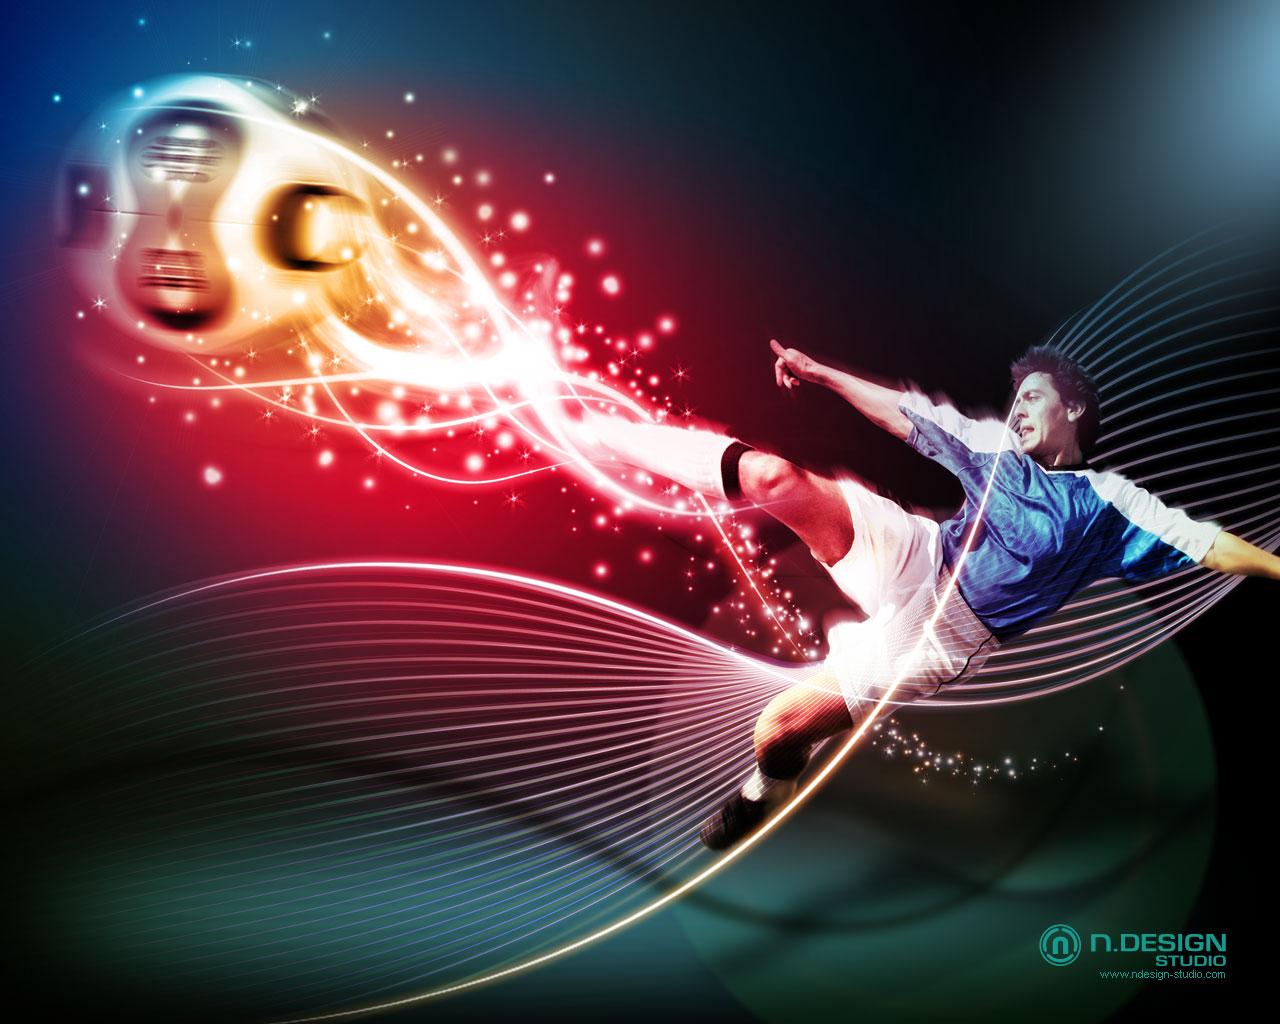 http://1.bp.blogspot.com/-oJA6FfWrNbQ/ULTibqf_LOI/AAAAAAAABFE/Ww87ZPhCjE0/s1600/football.jpg